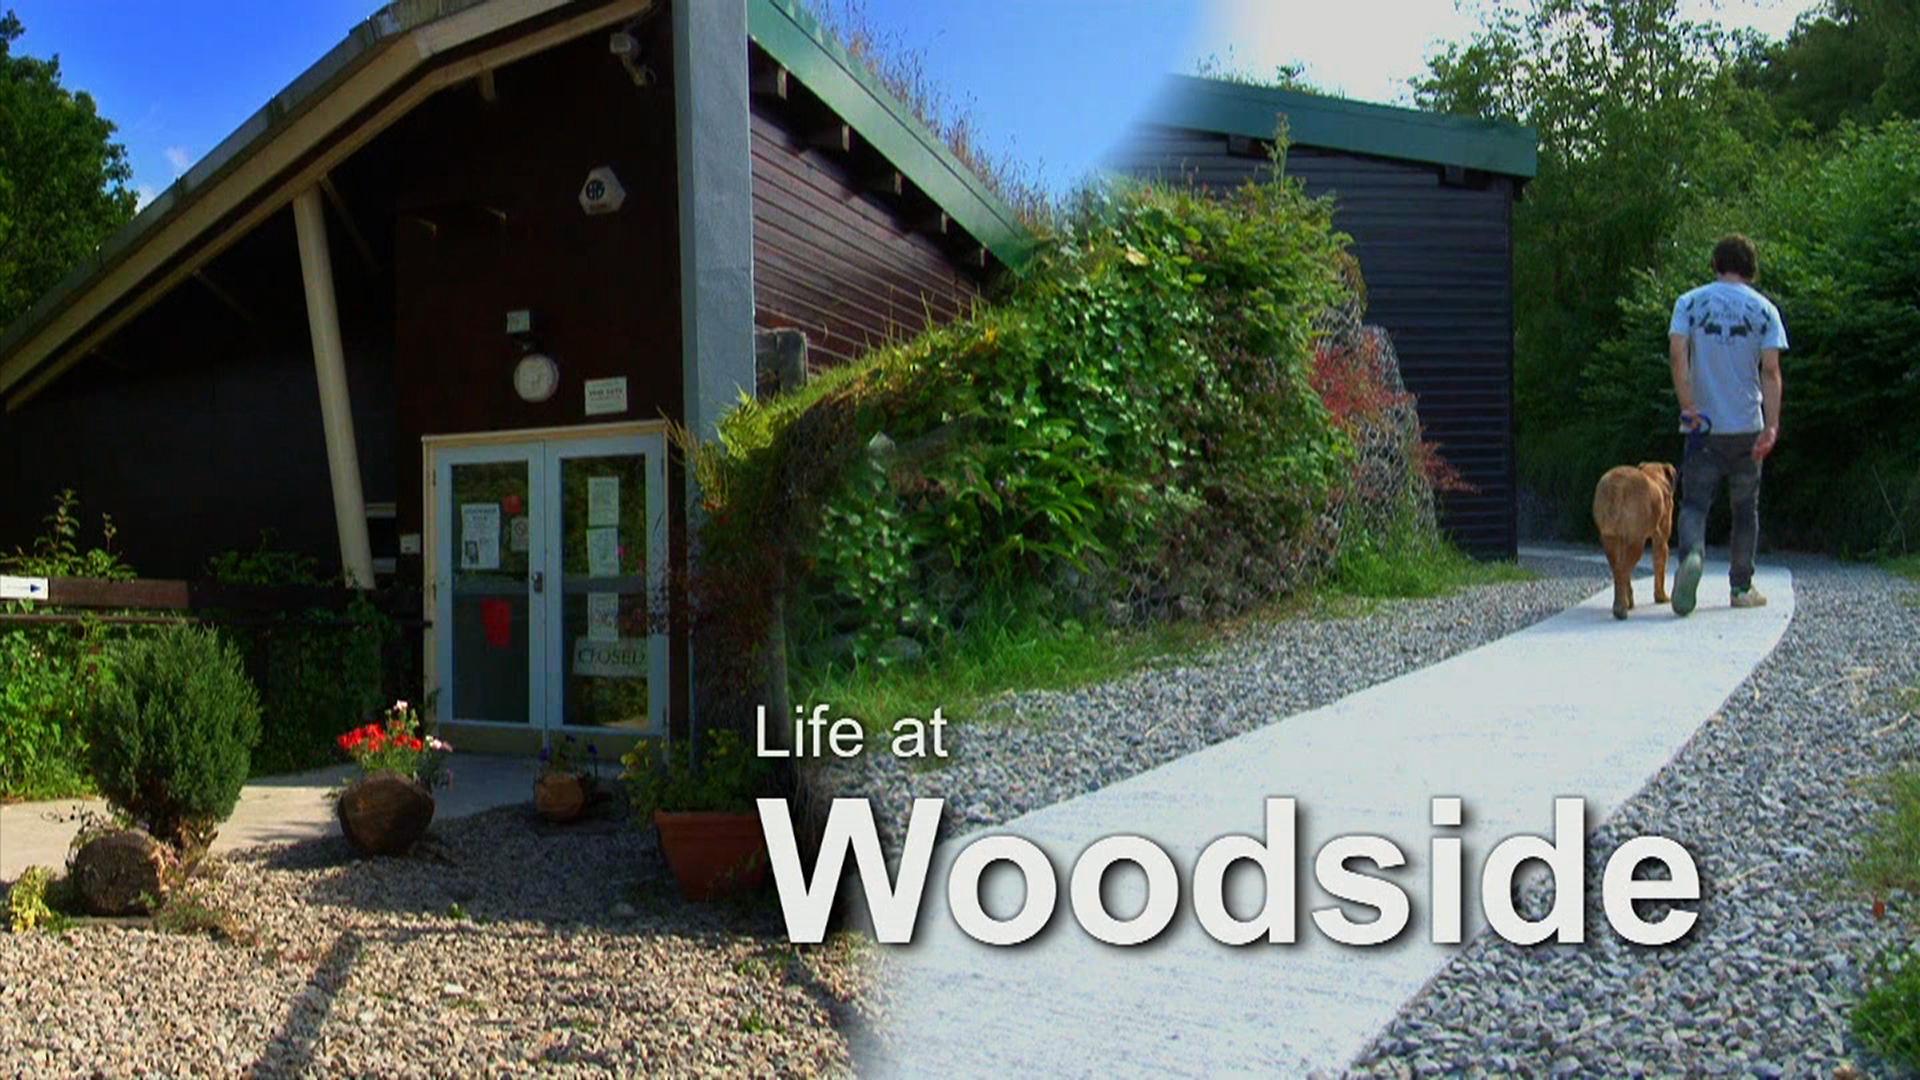 Life at Woodside